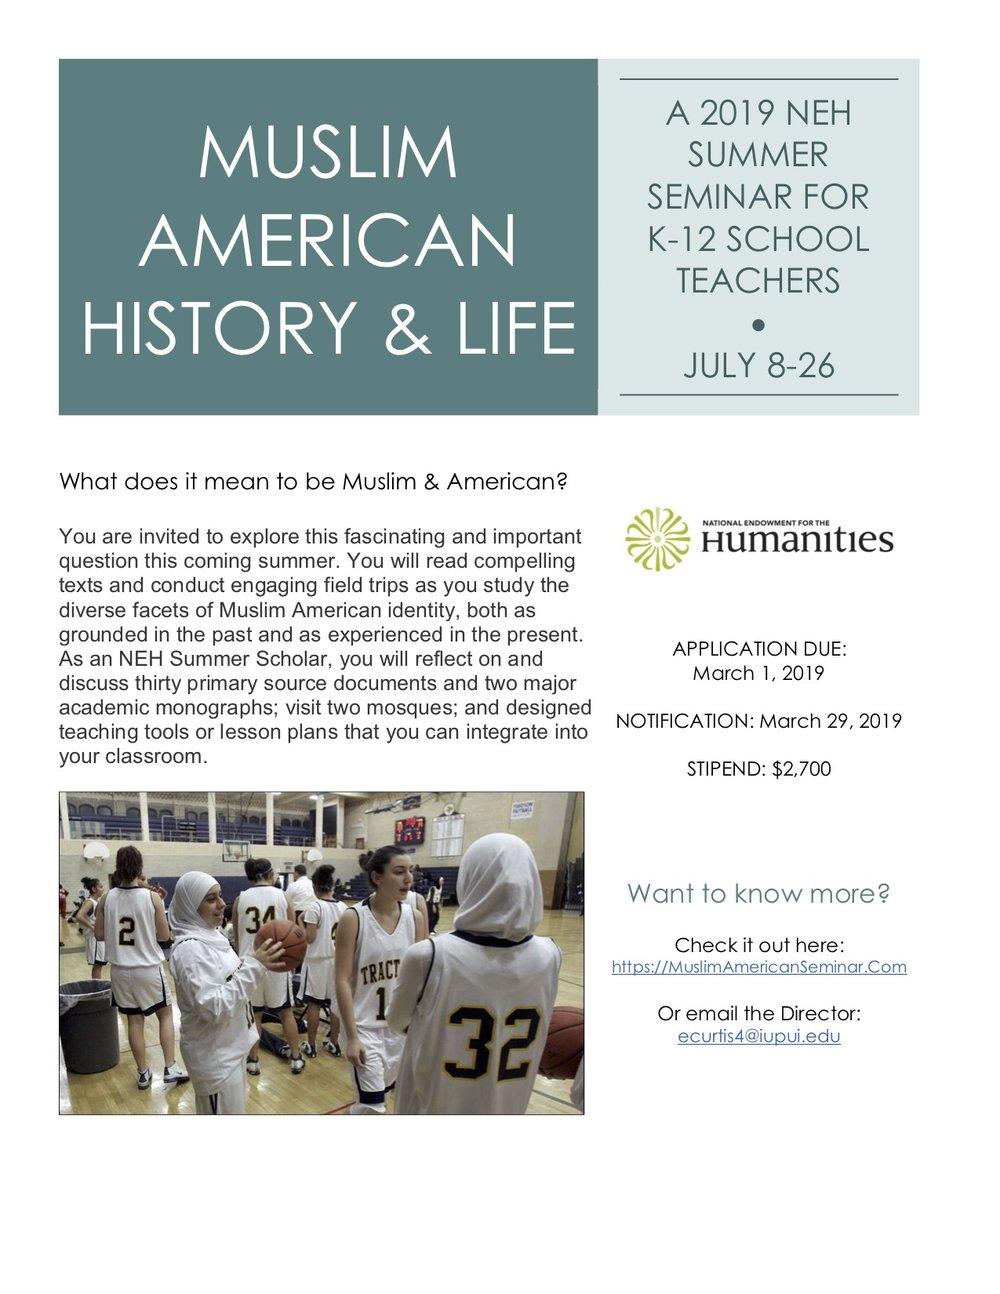 Muslim American History and Life 2019.jpg